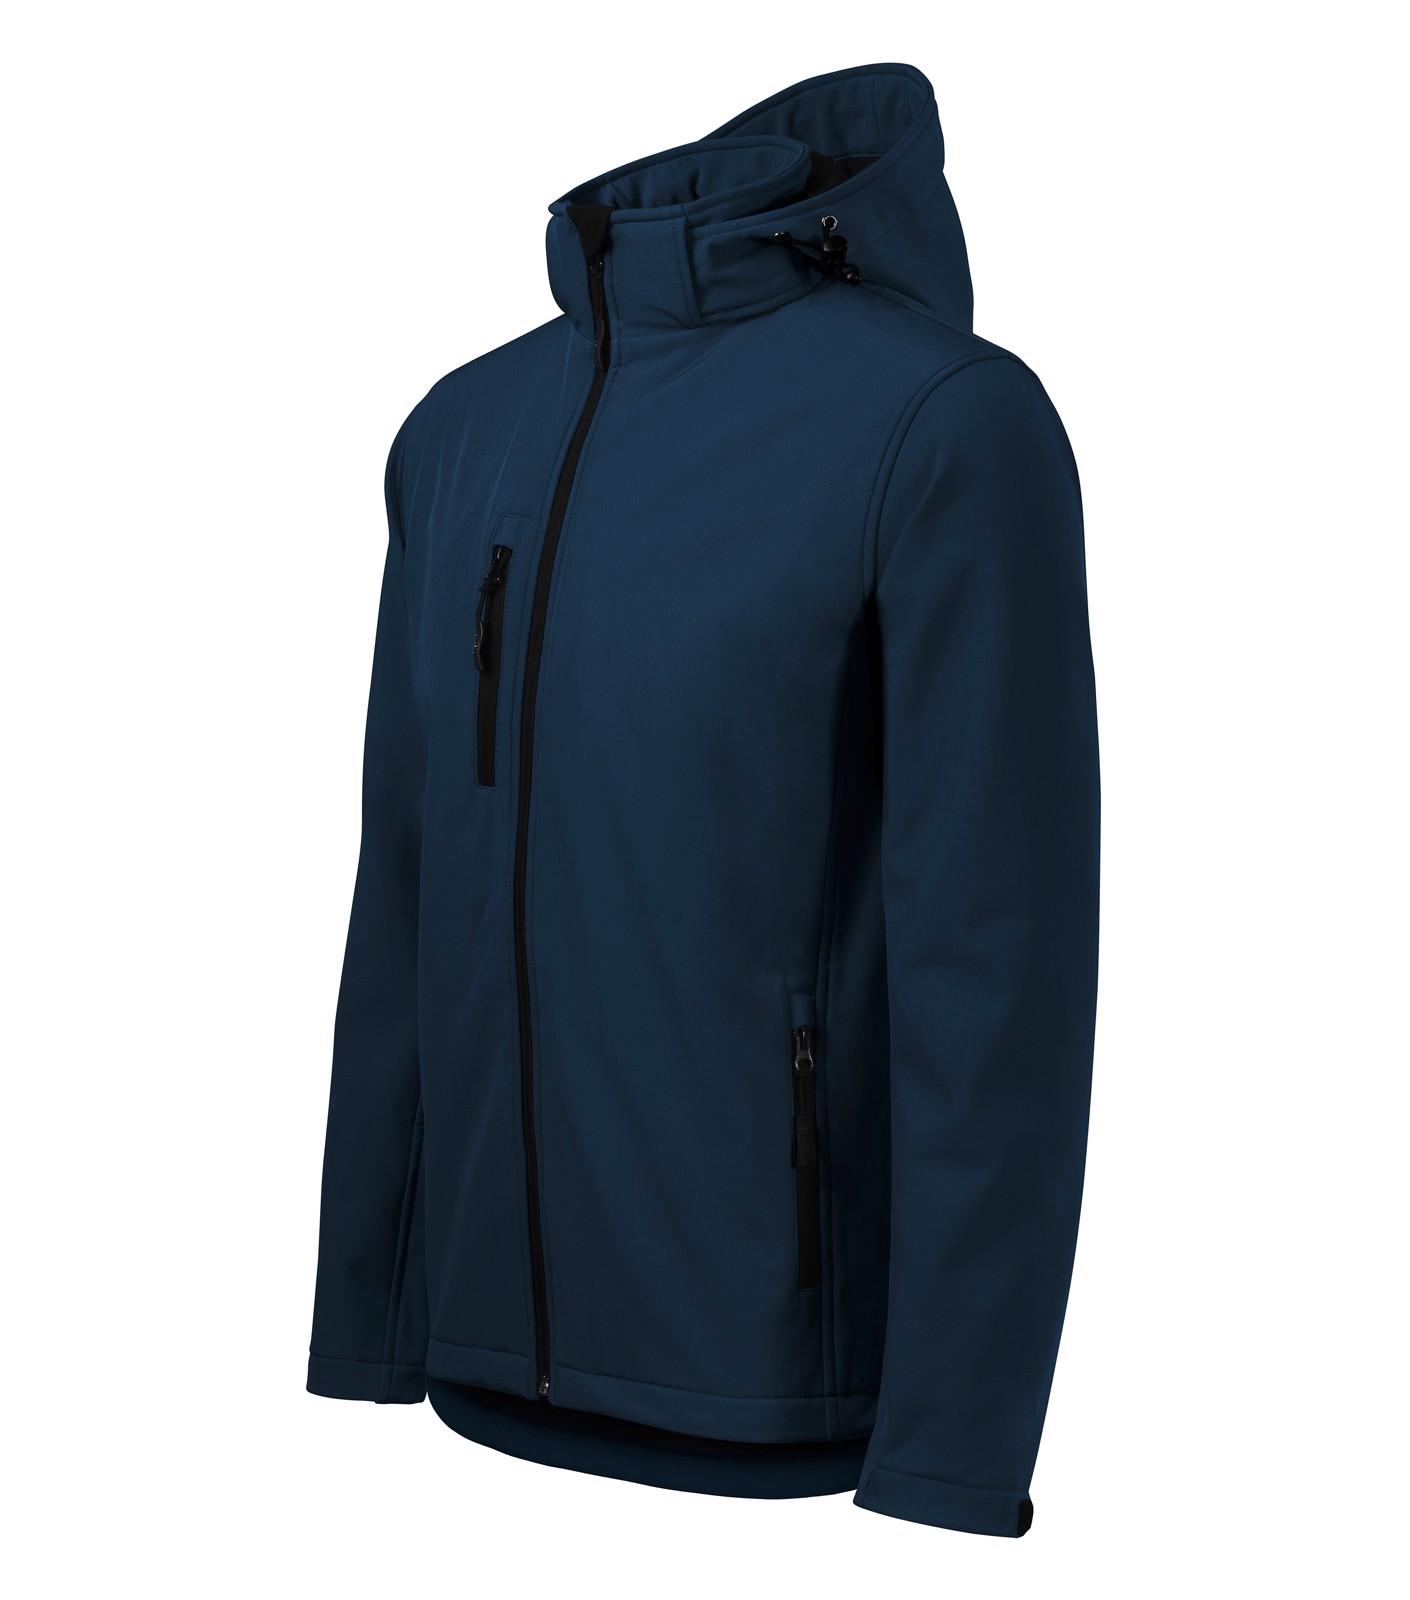 Softshell Jacket Gents Malfini Performance - Navy Blue / 2XL